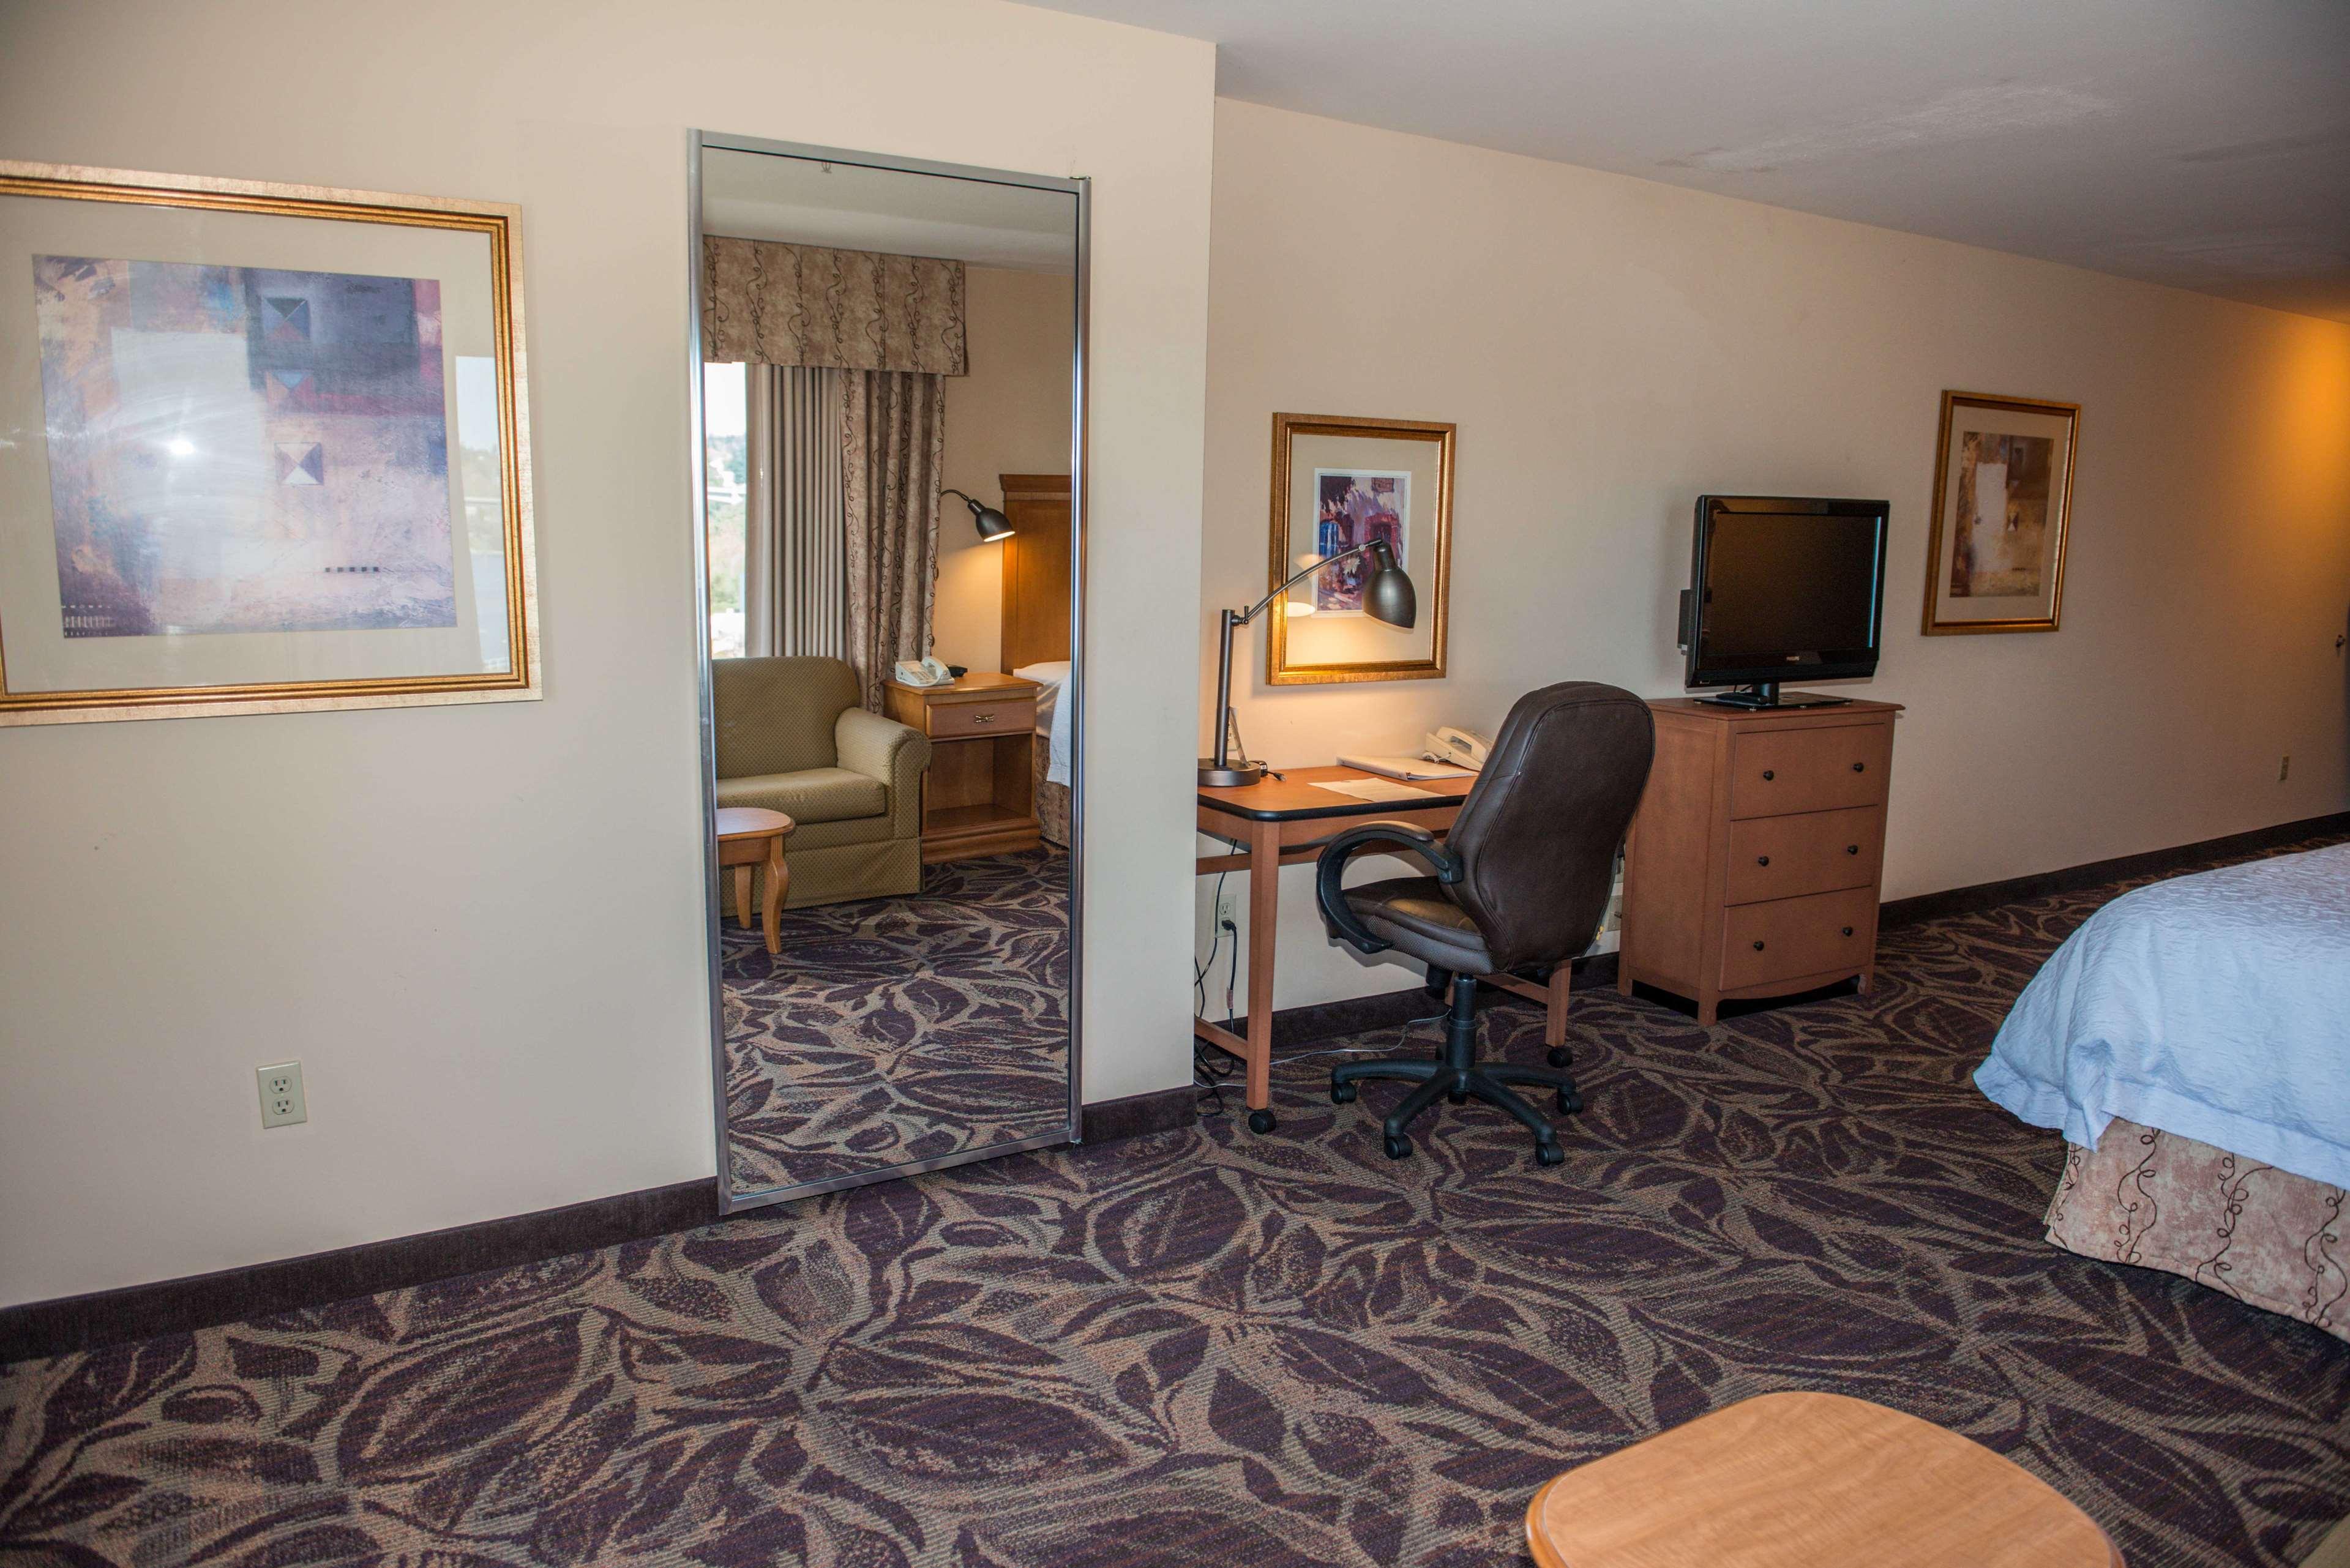 Hampton Inn & Suites Bremerton image 36